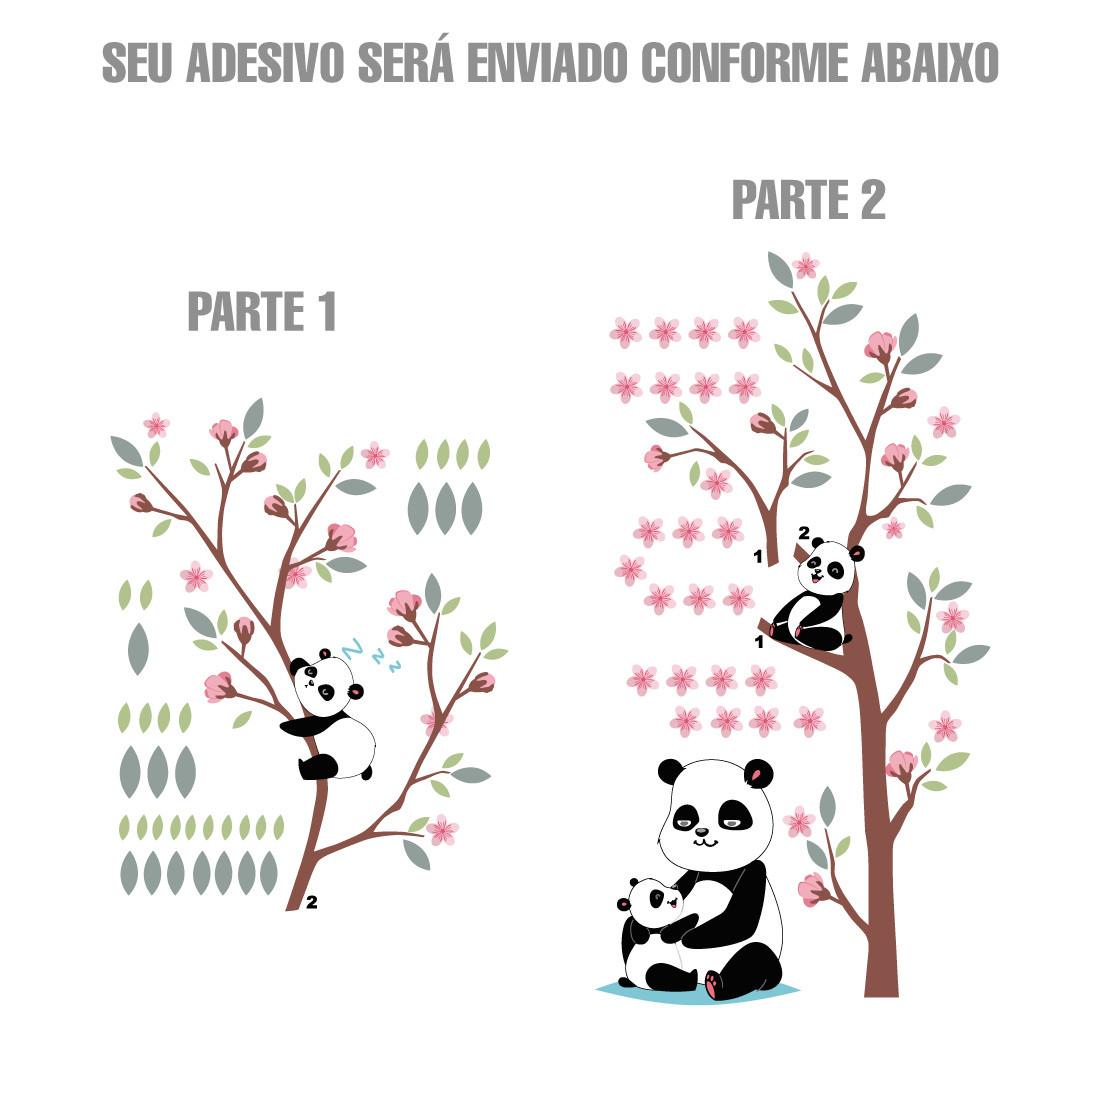 Adesivo de Parede Mamãe Panda arvore